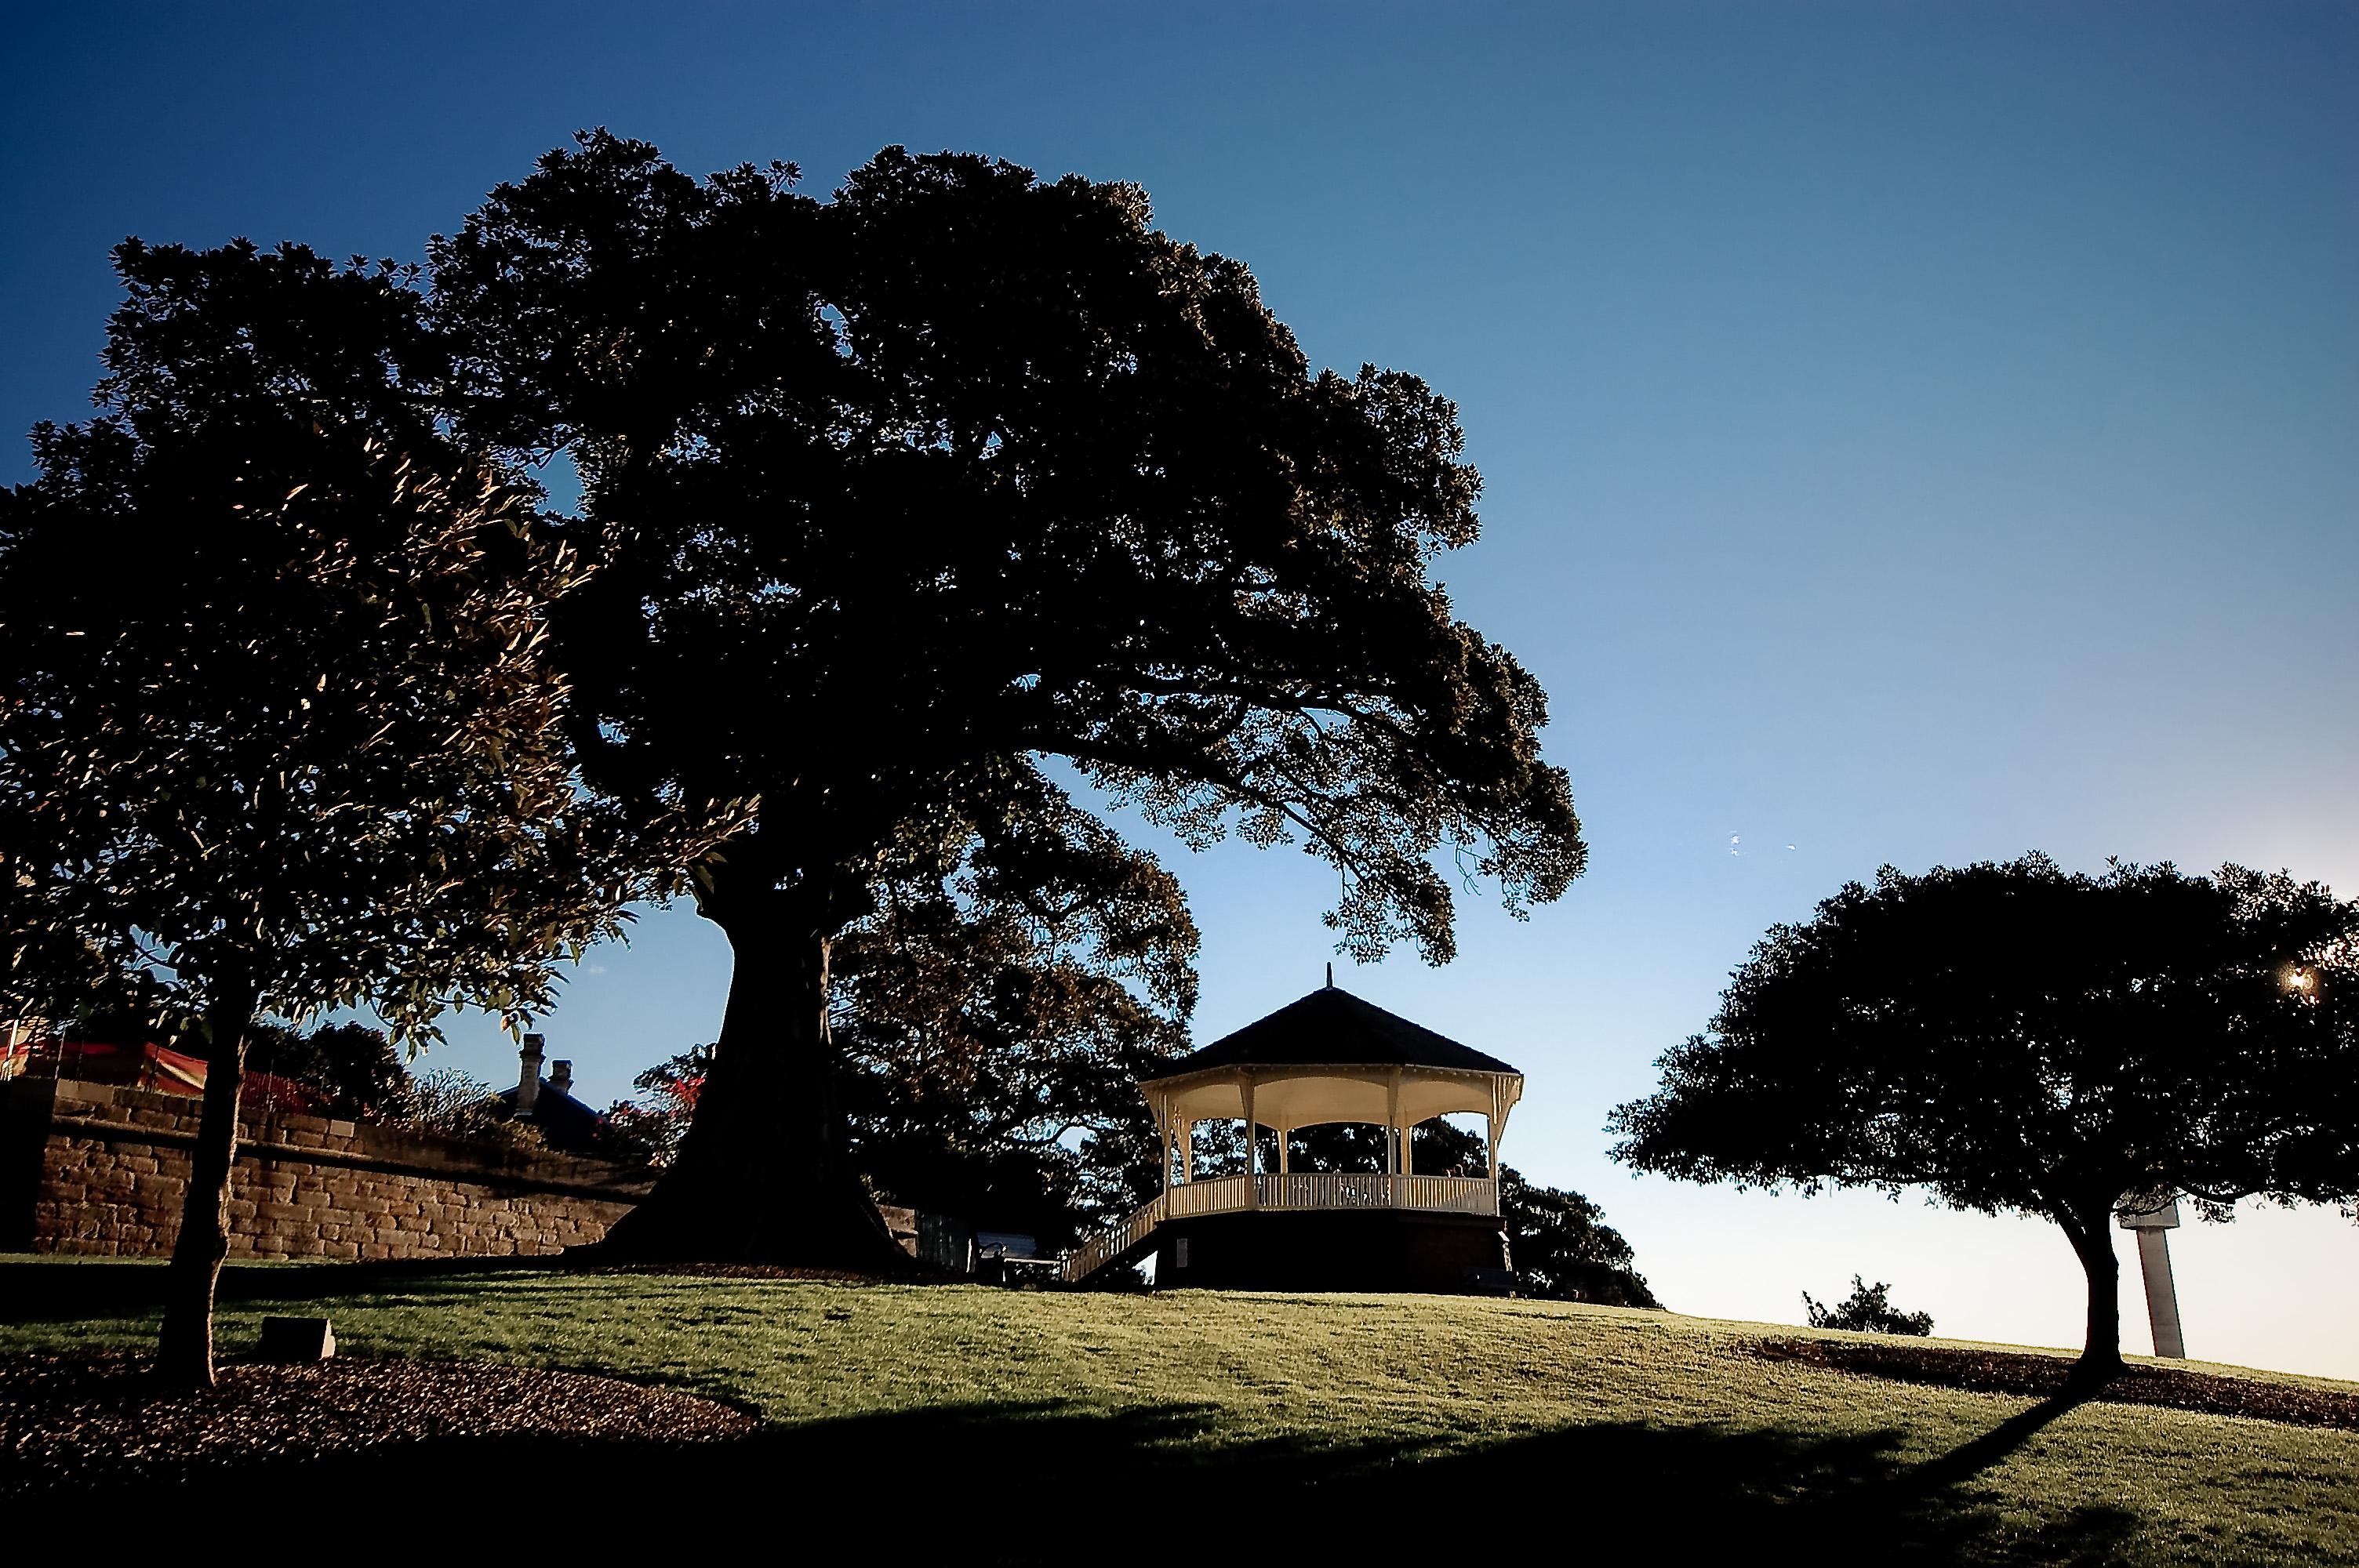 observatory hill sydney australia - photo#14